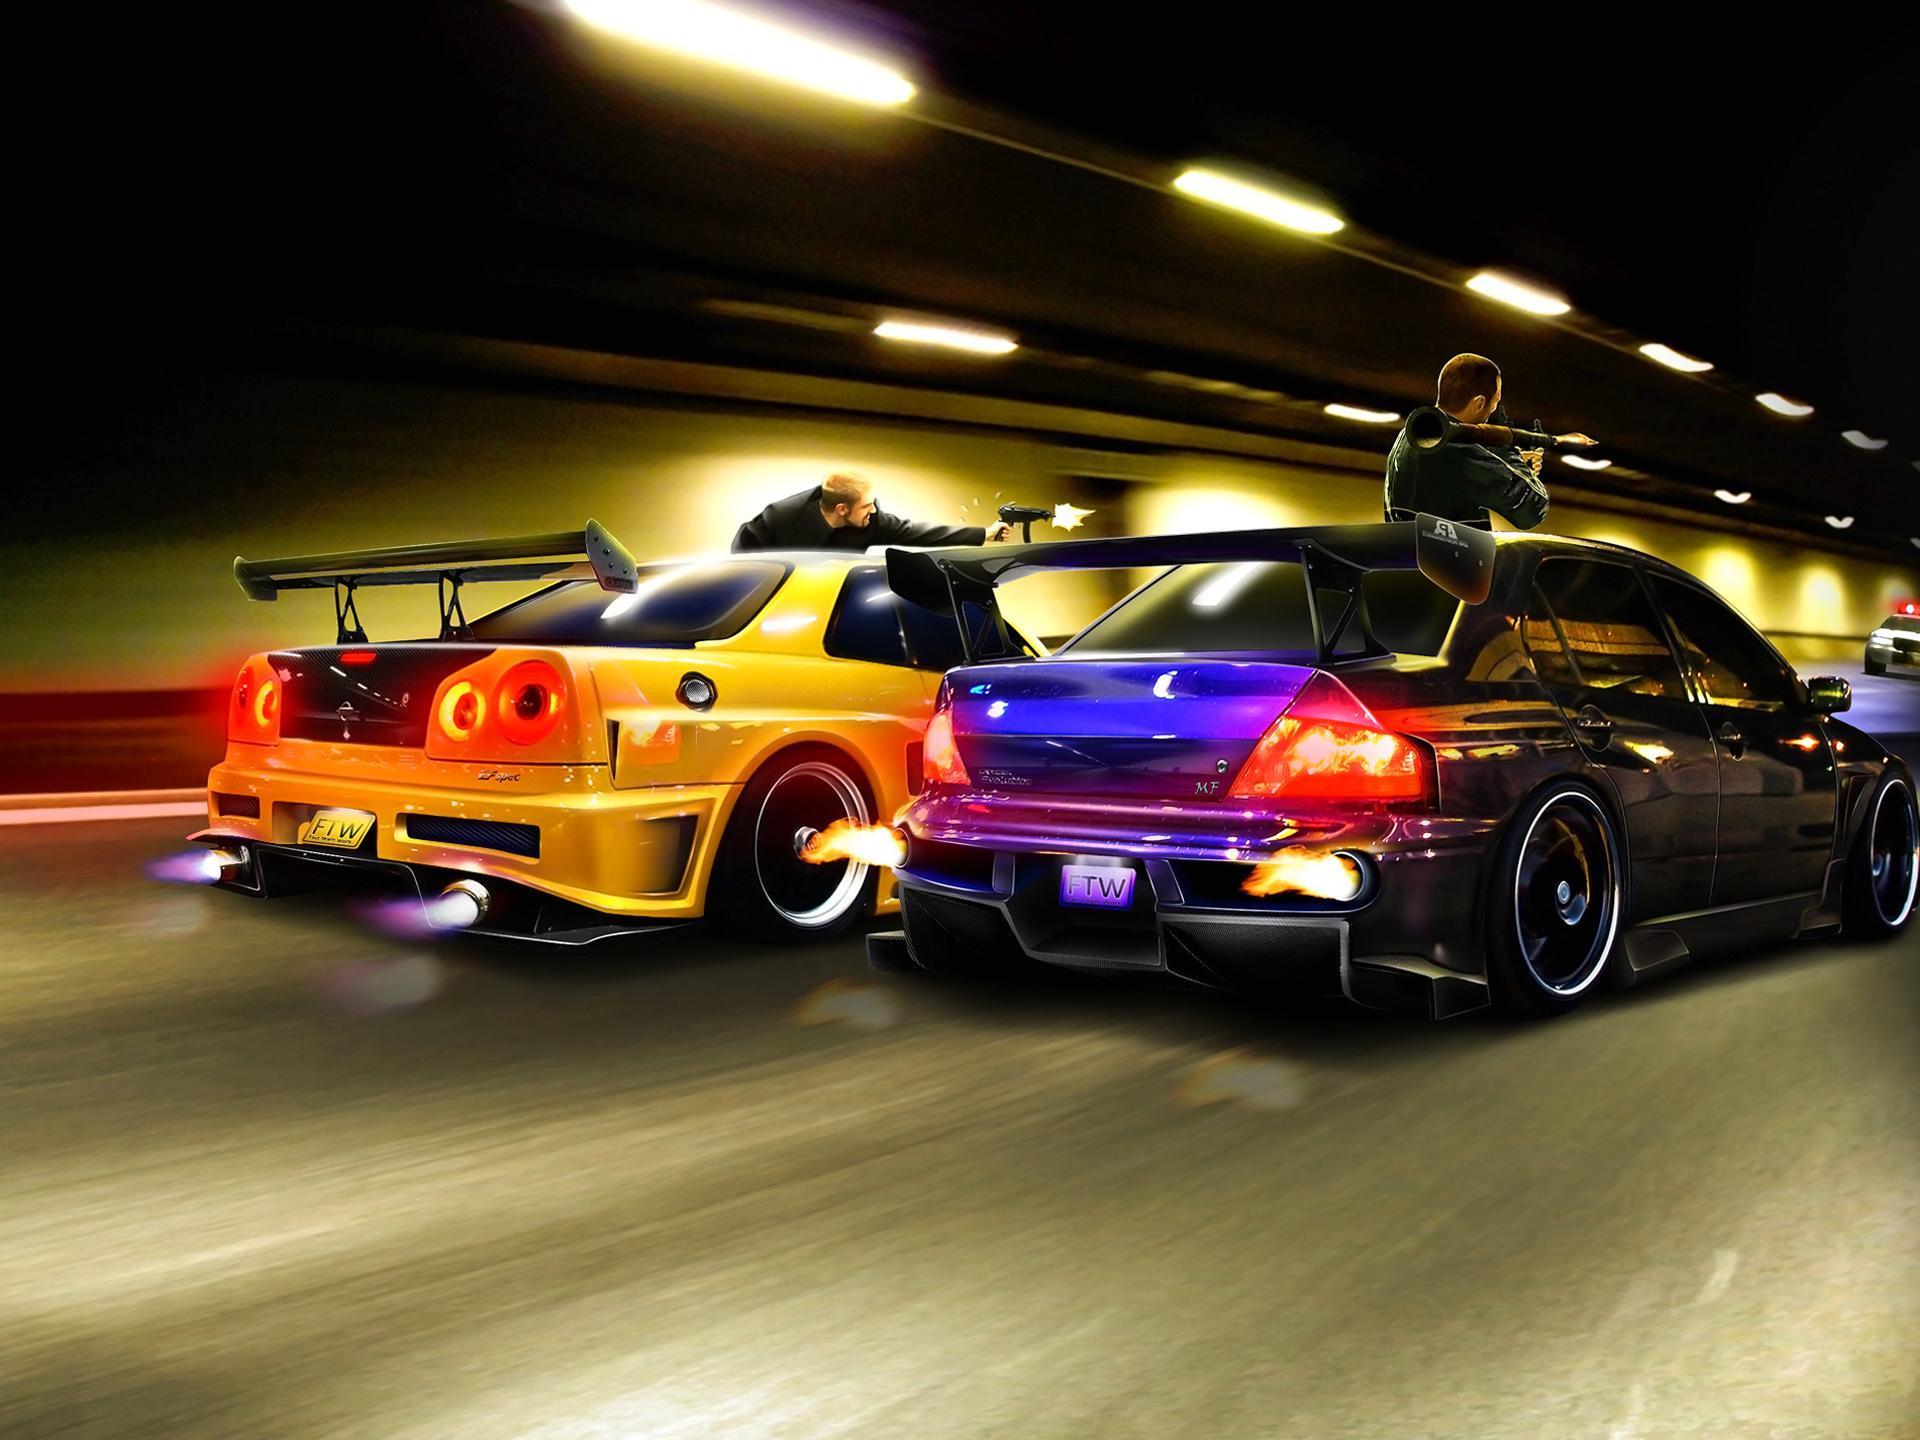 Japan cars wallpapers wallpaper cave - Racing cars wallpapers for mobile ...